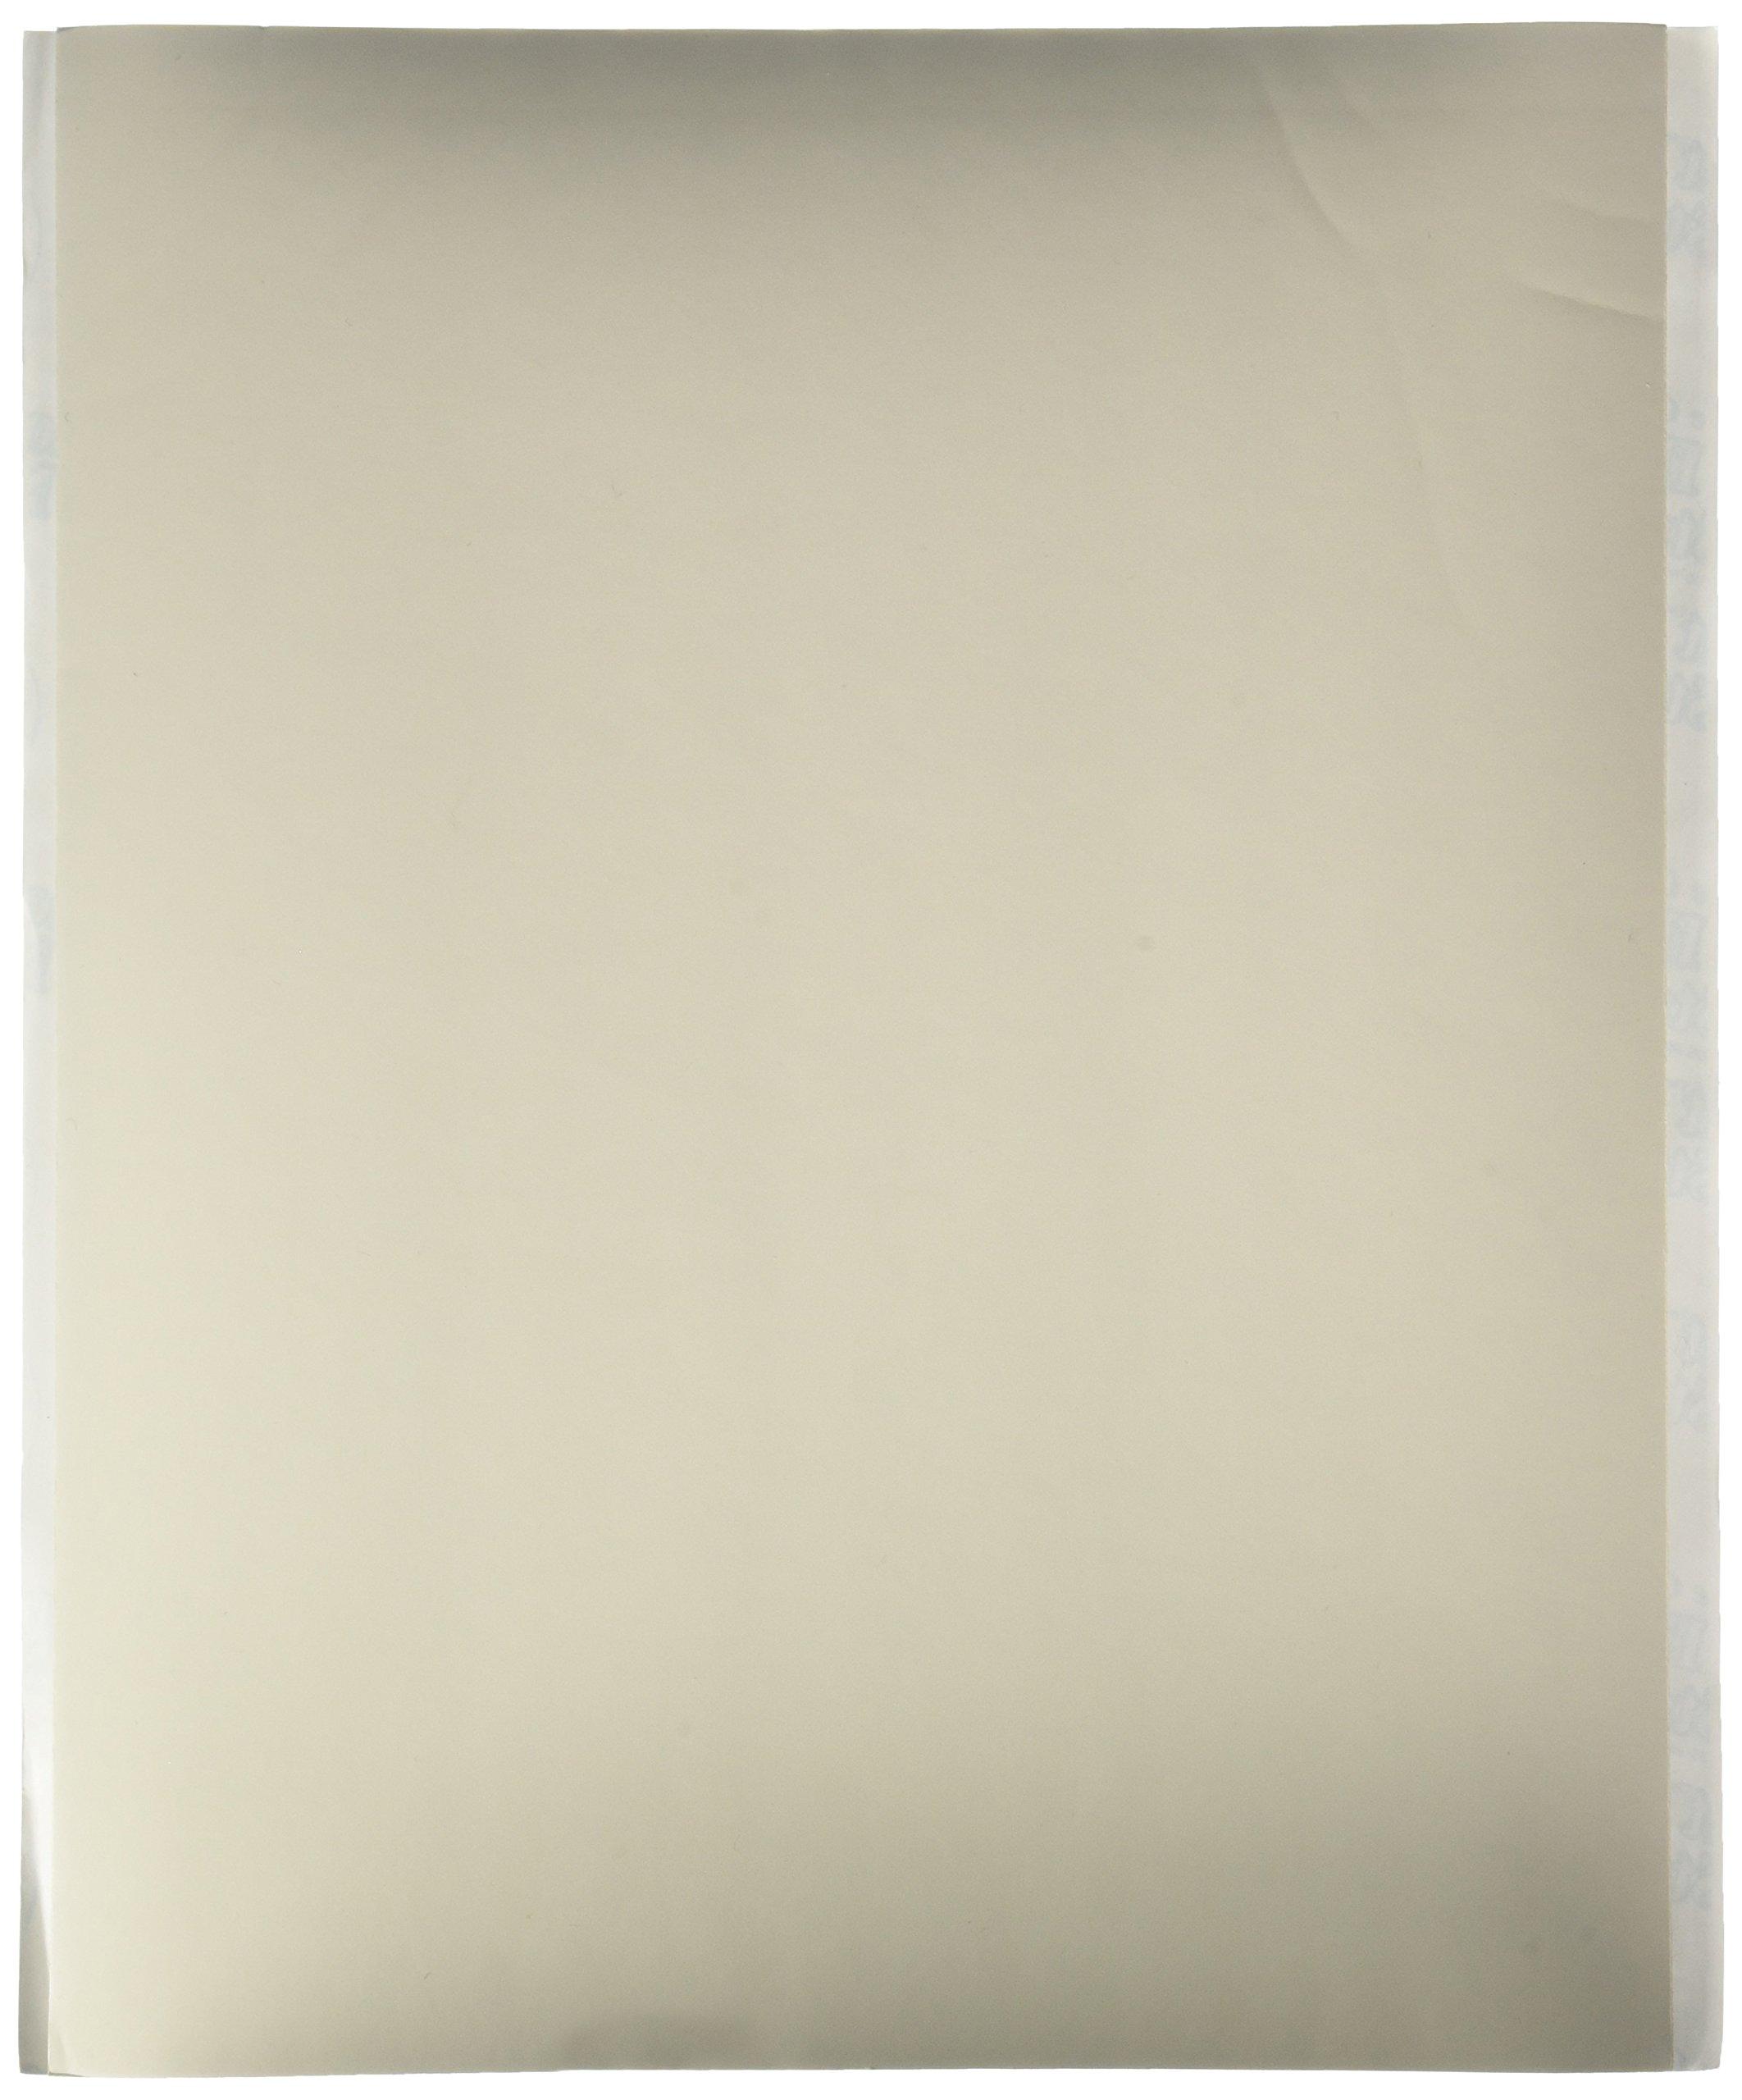 EZ Mount 8.5x11 Static Cling Mounting Foam 10-Pack: Gray Foam